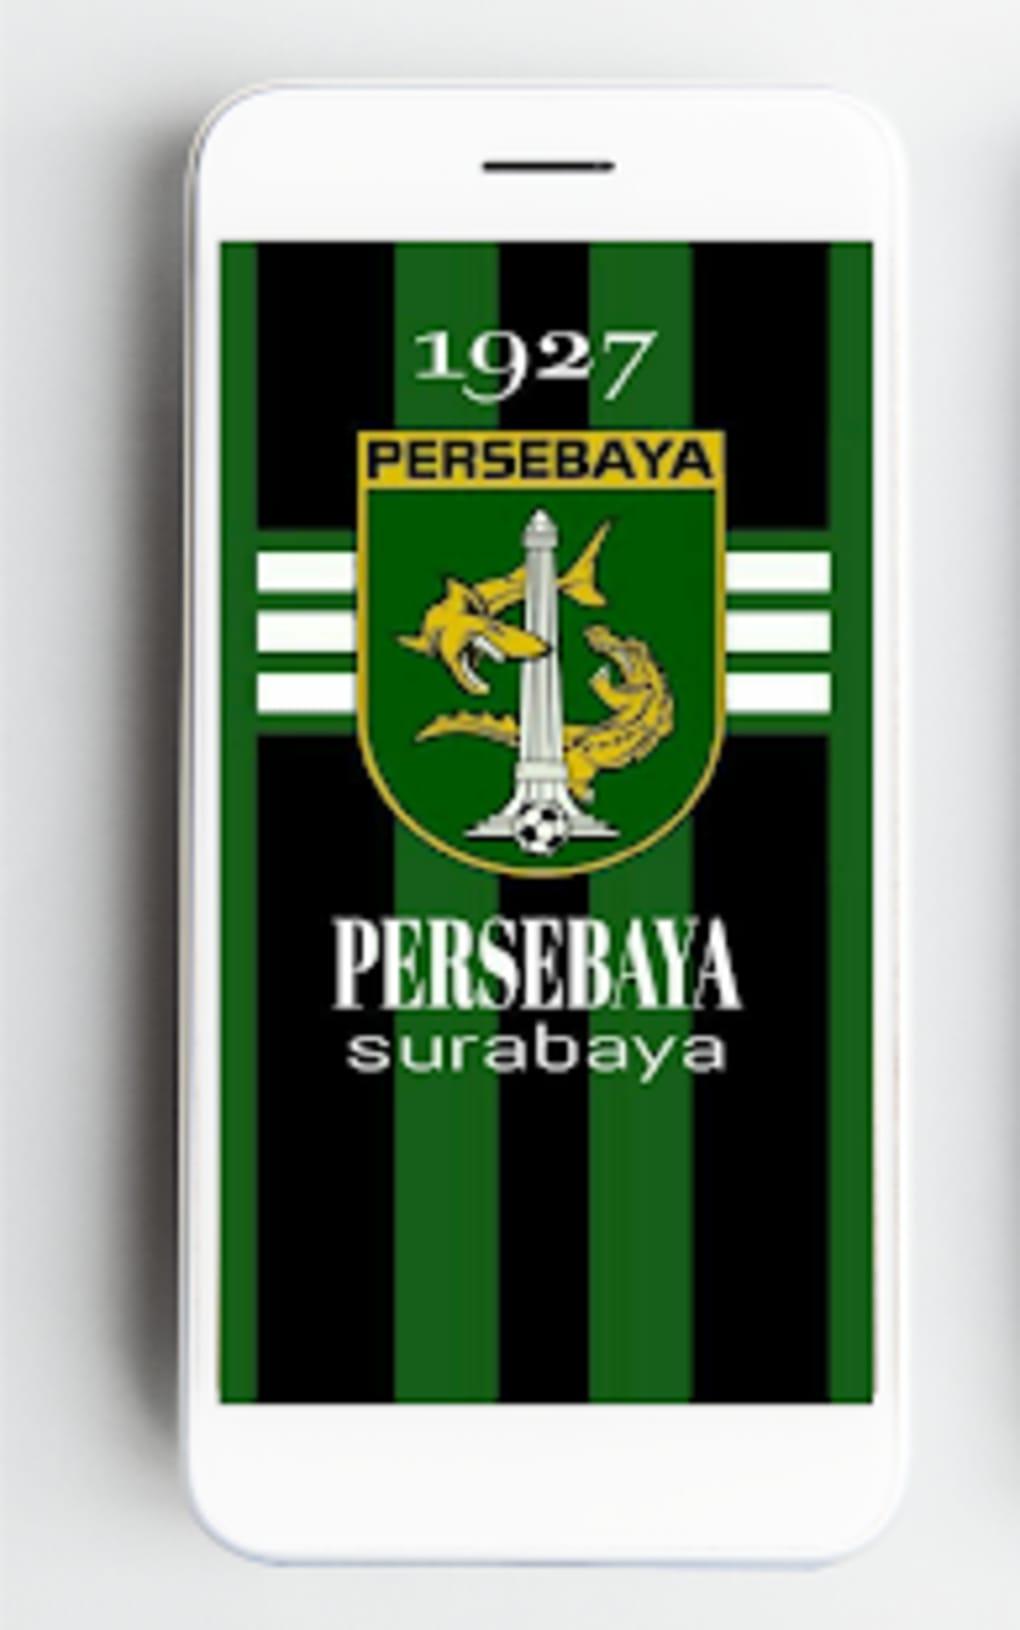 Wallpaper Bonek Persebaya Persebaya 1927 1020x1630 Wallpaper Teahub Io